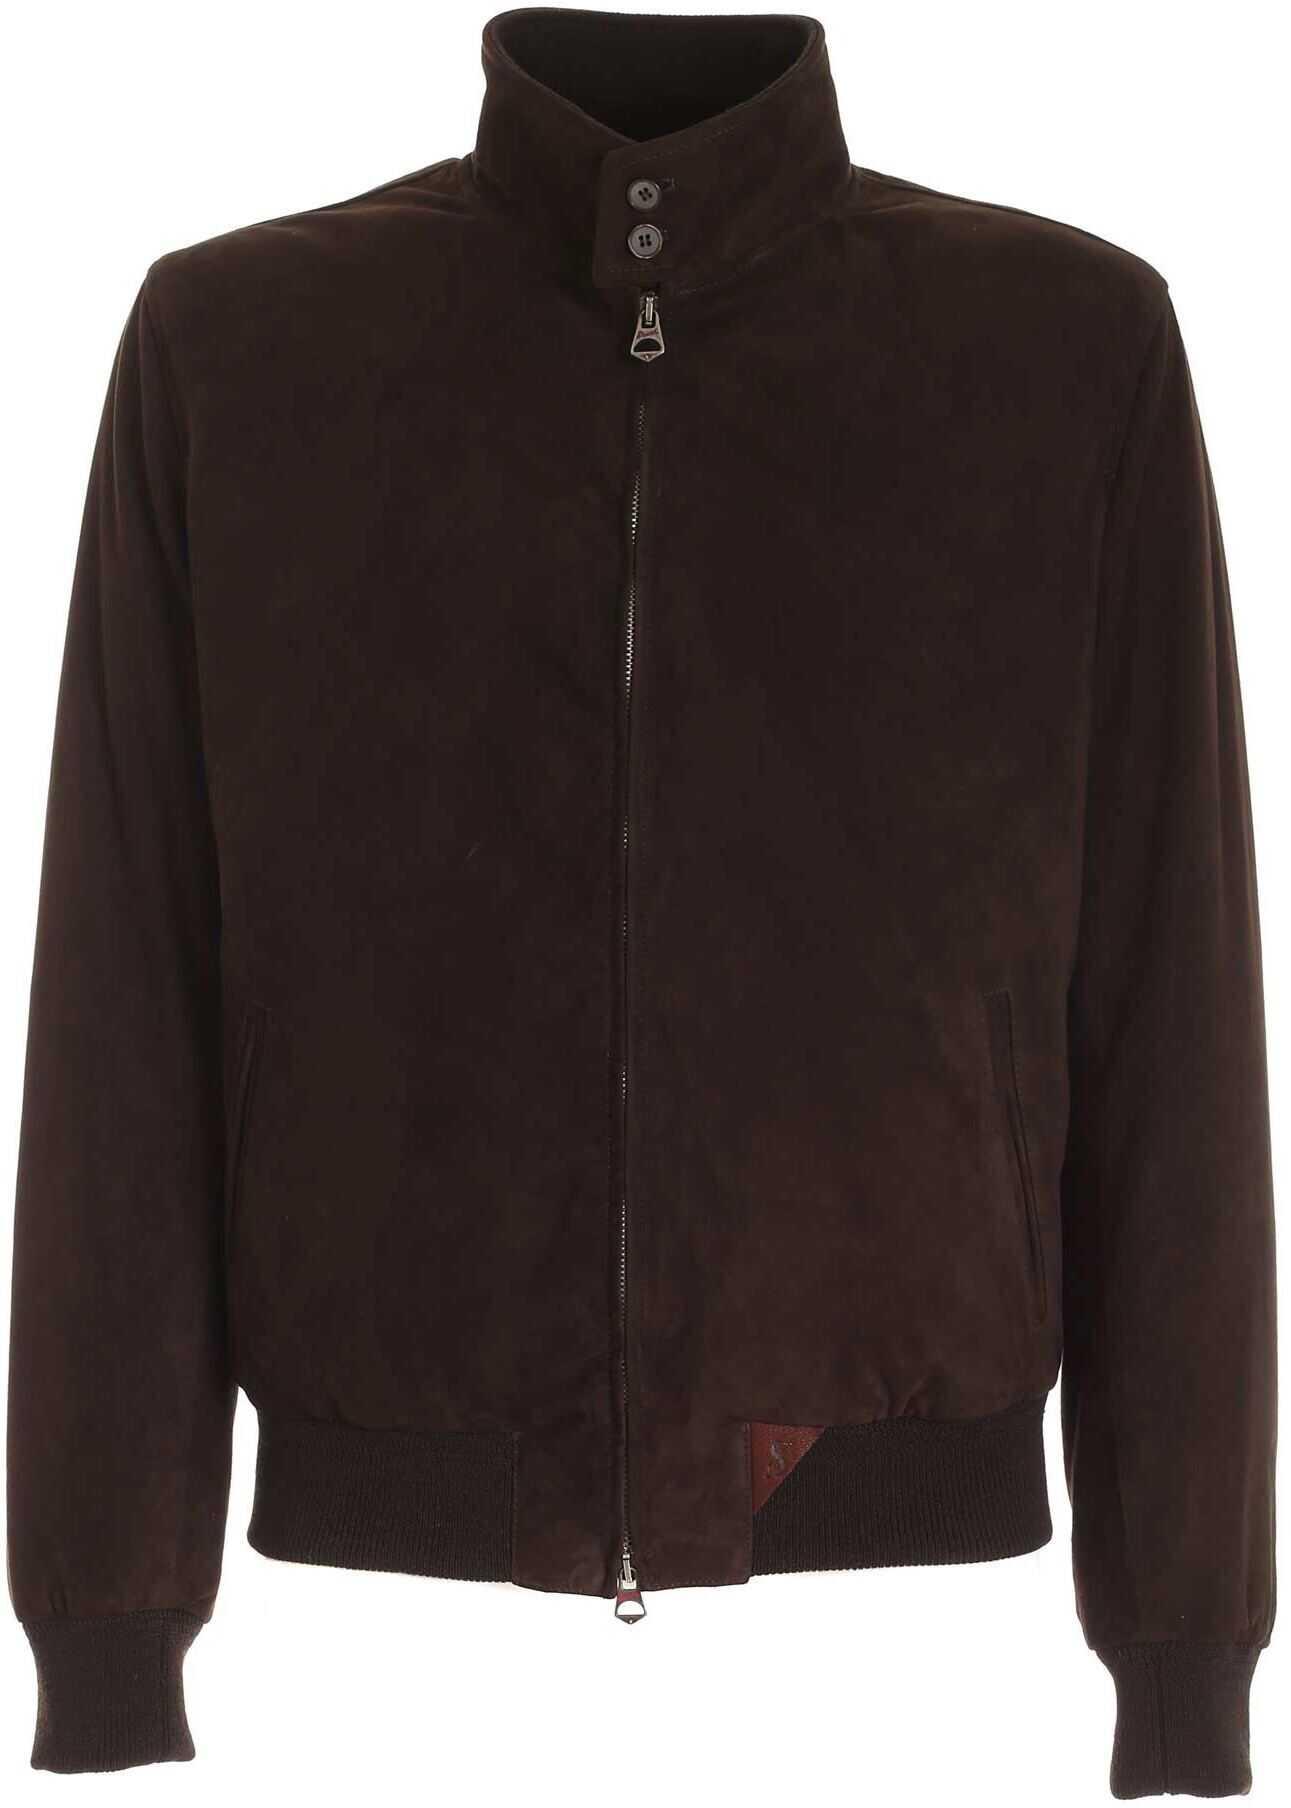 Stewart Leather Jacket In Brown Brown imagine